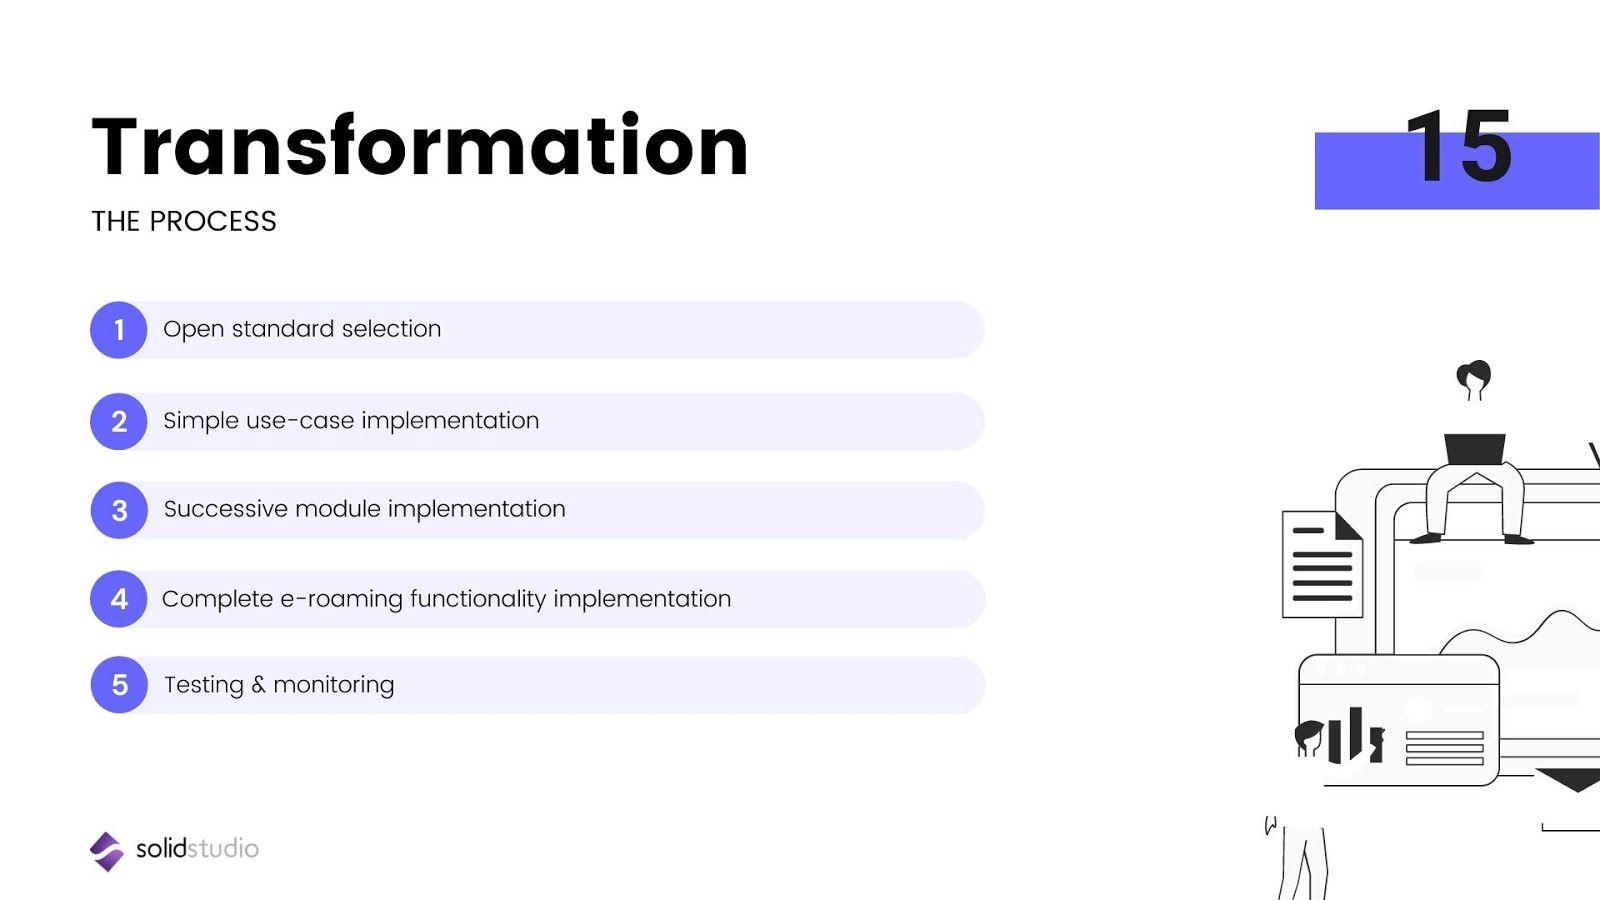 Unlocking eMobility platform using Open Standards - Transformation process